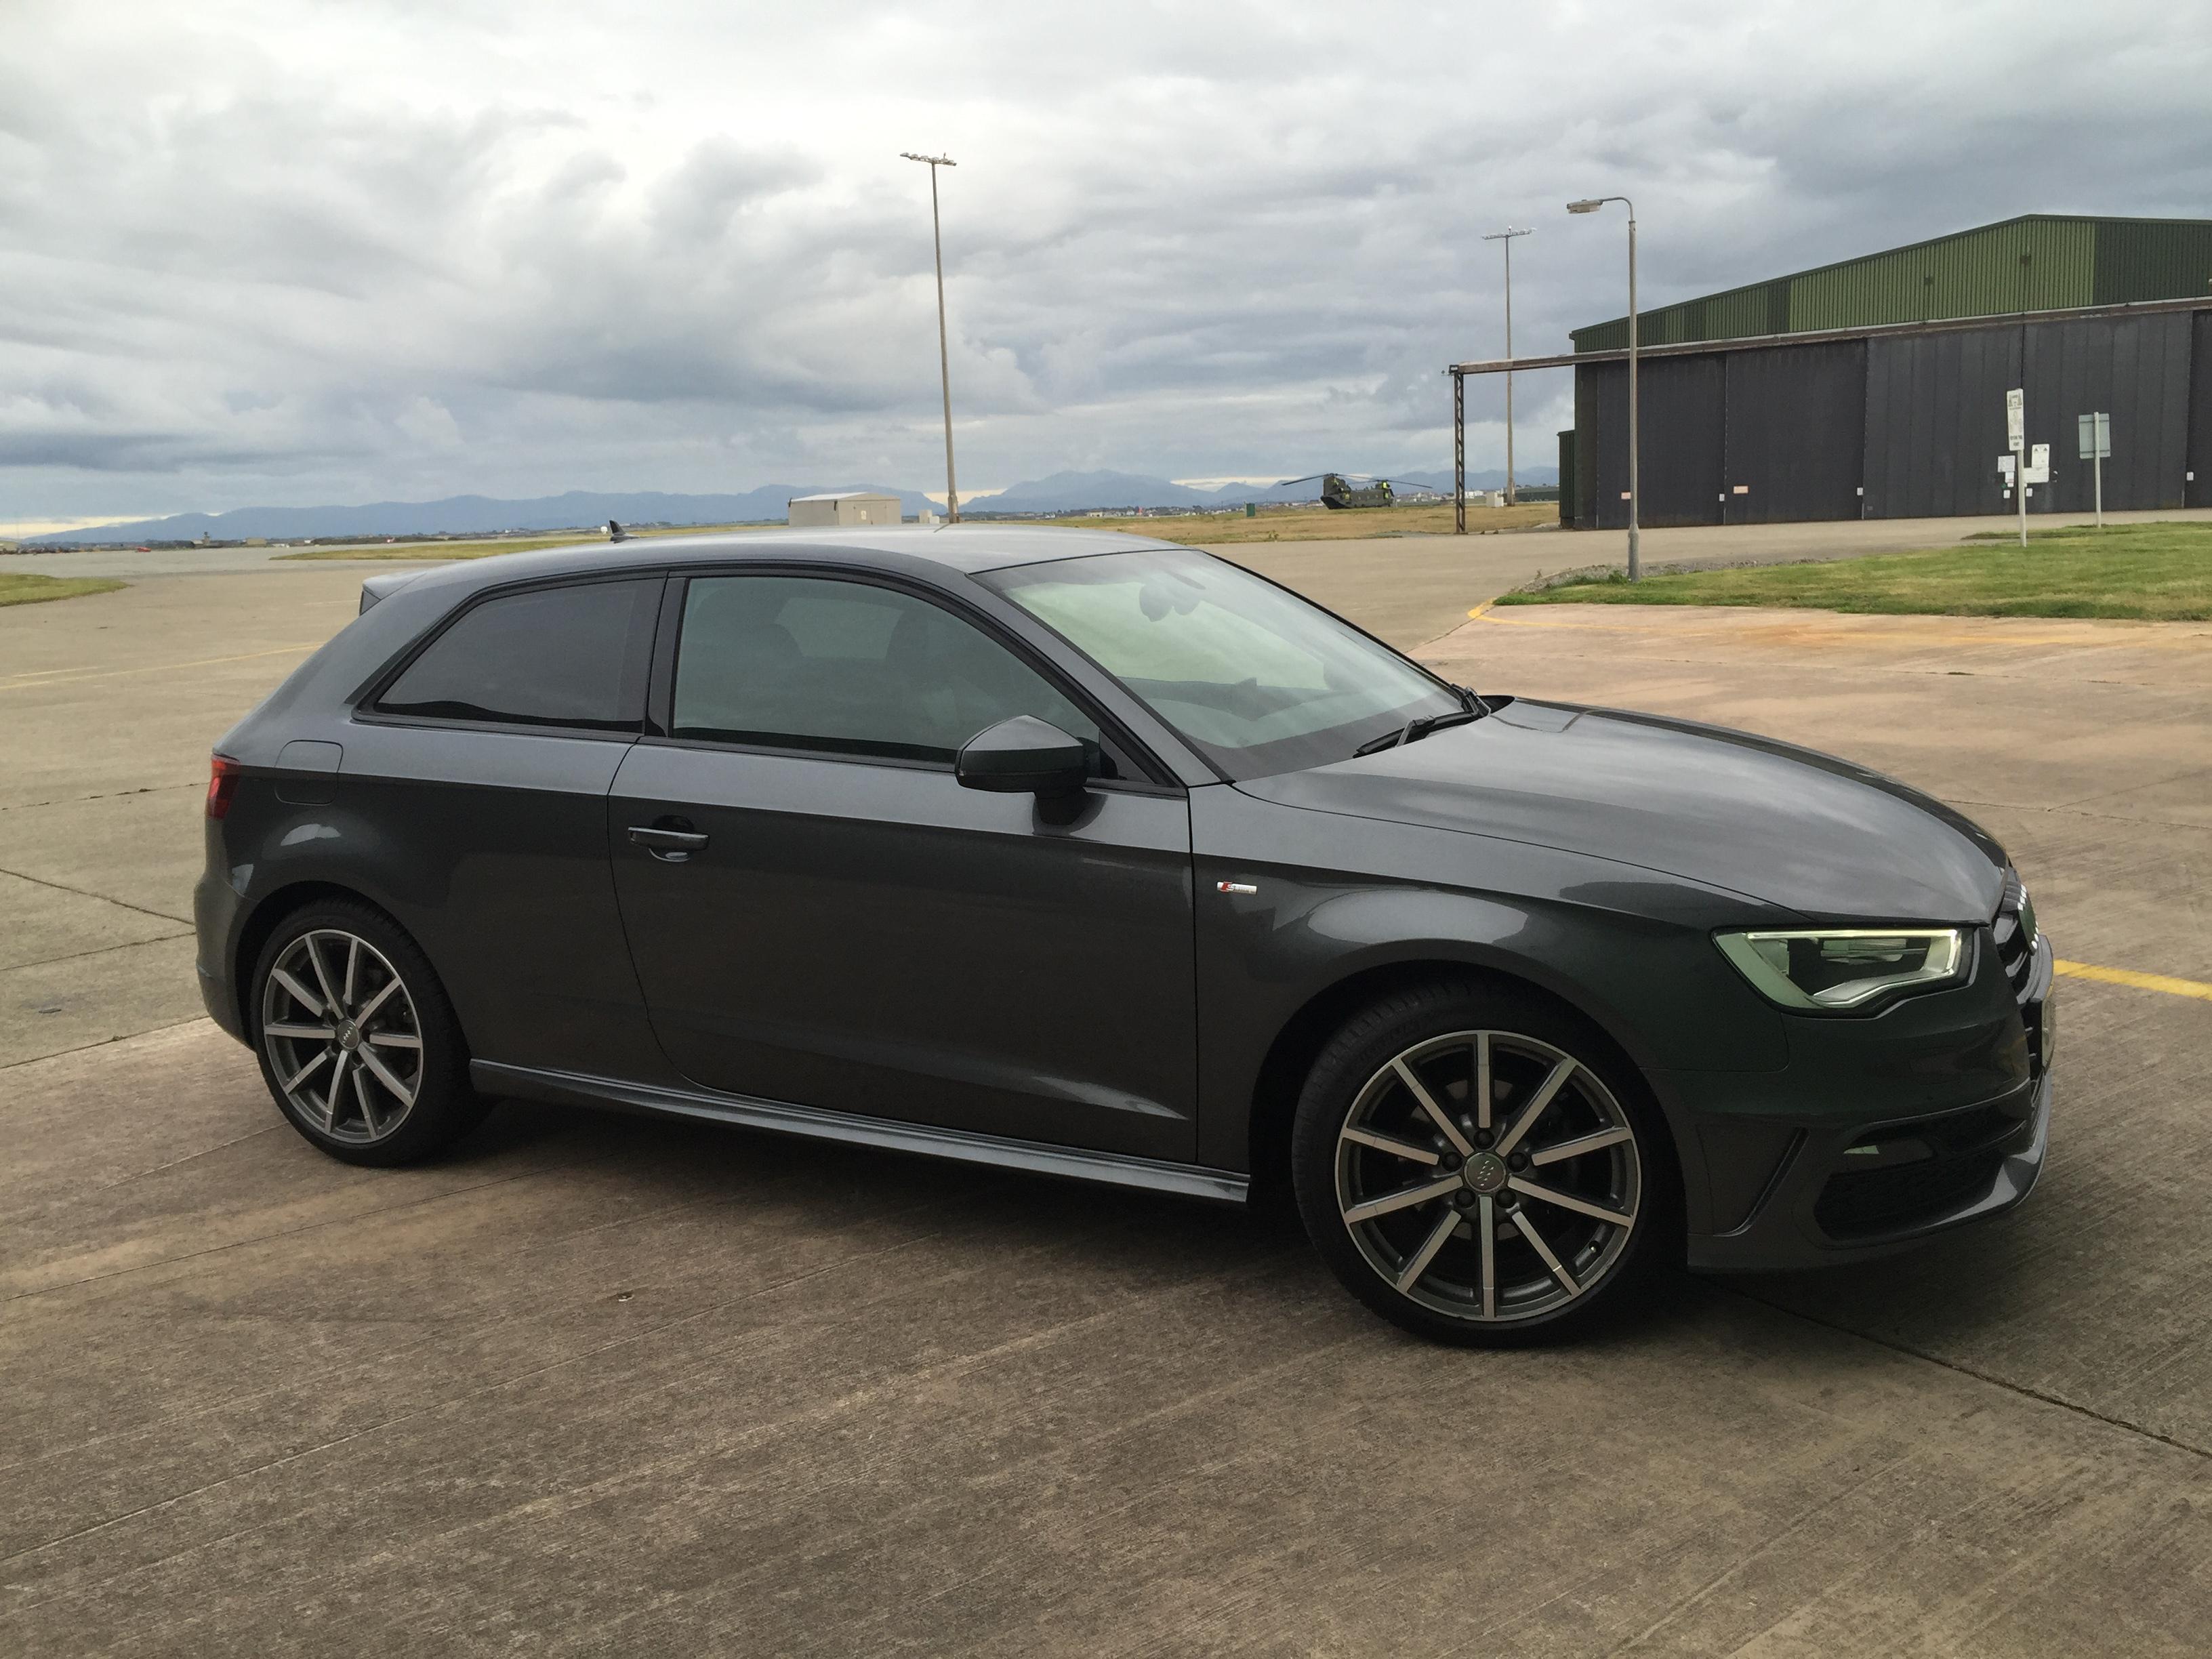 Kelebihan Audi A3 V8 Murah Berkualitas